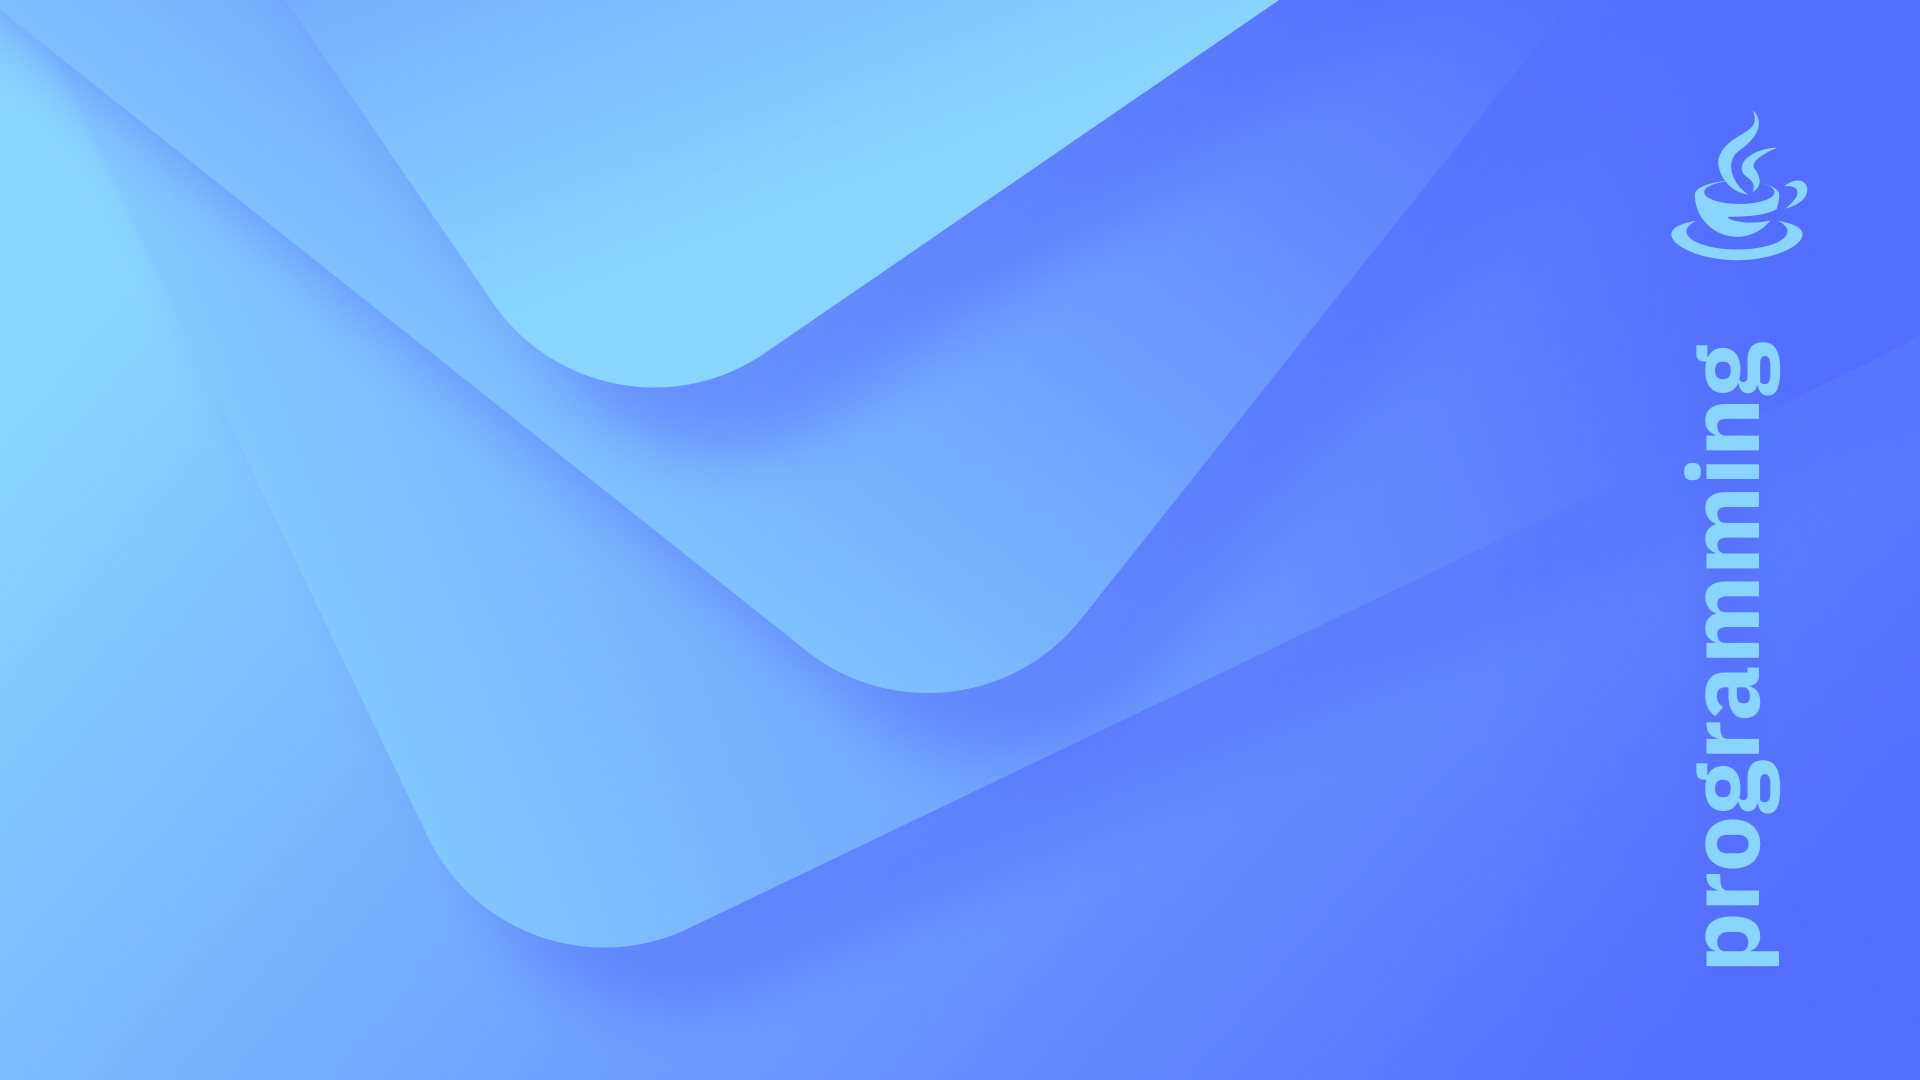 Вебинар Транзакции в приложениях под SpringBoot фото